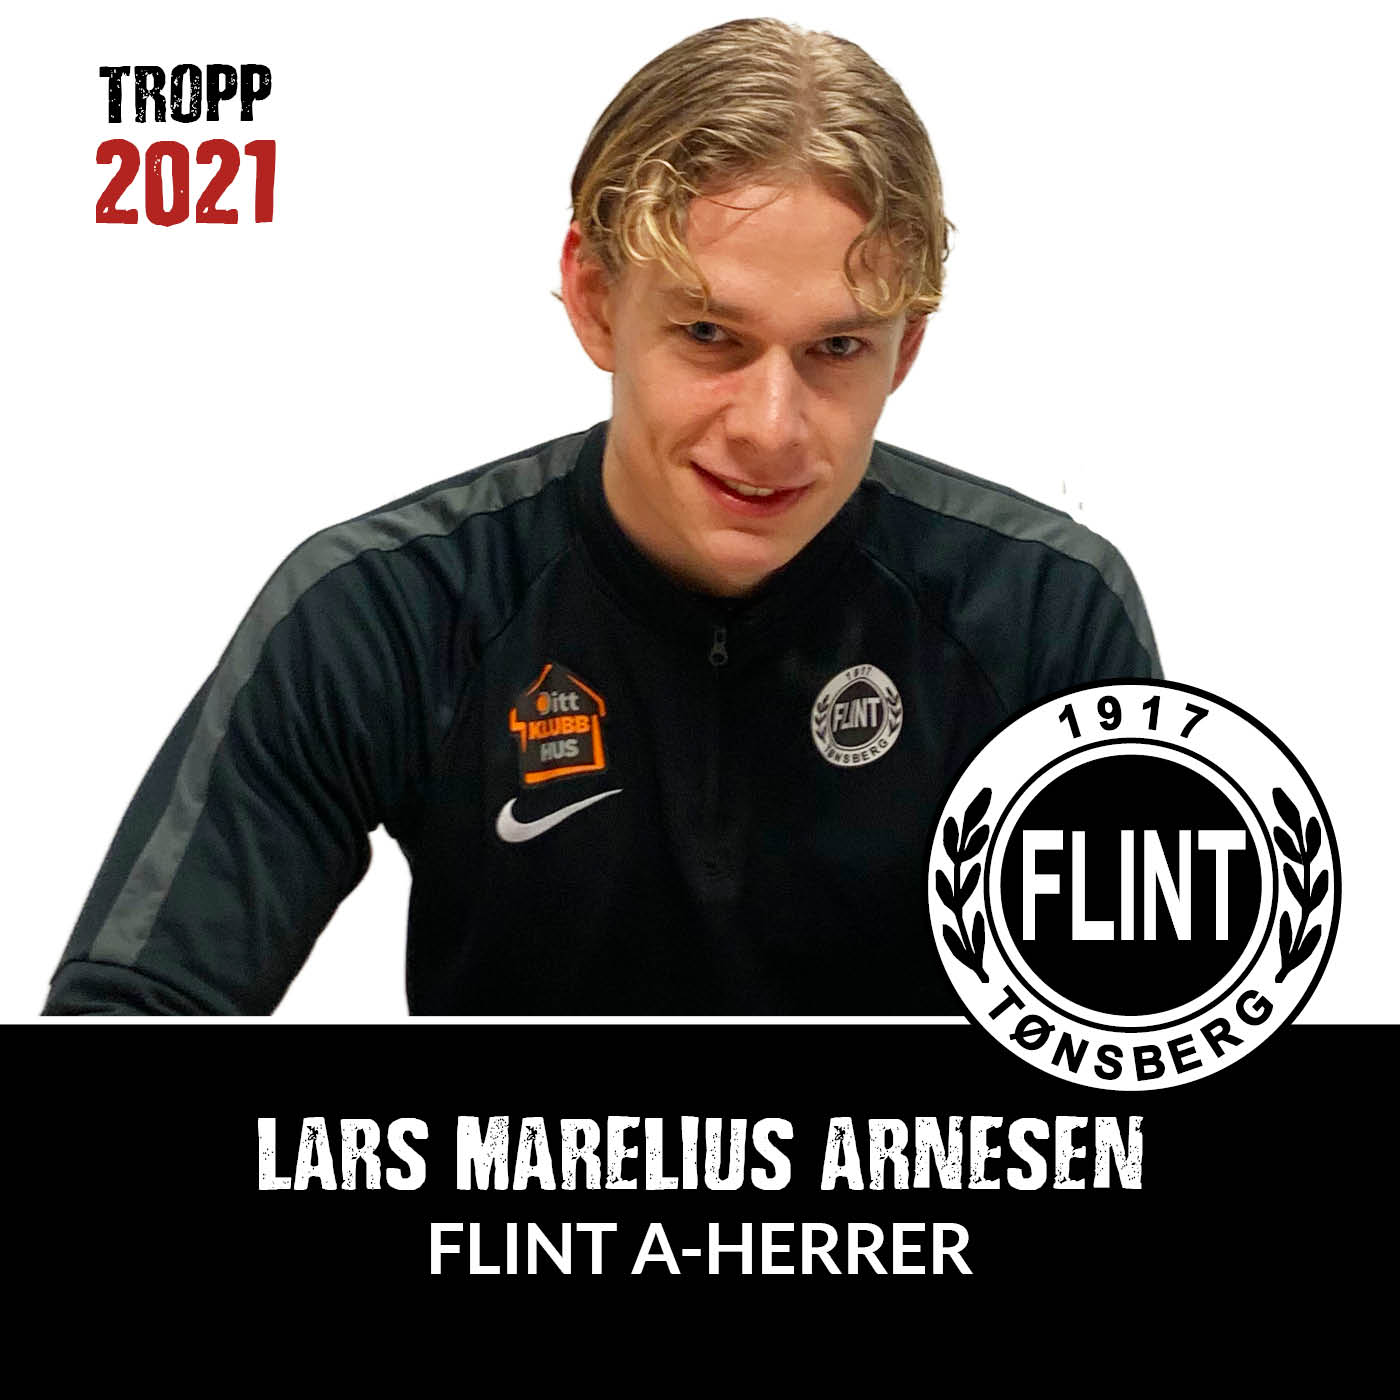 https://www.flintfotball.no/wp-content/uploads/2021/02/A-herrer-2021-Lars-Marelius-Arnesen.jpg